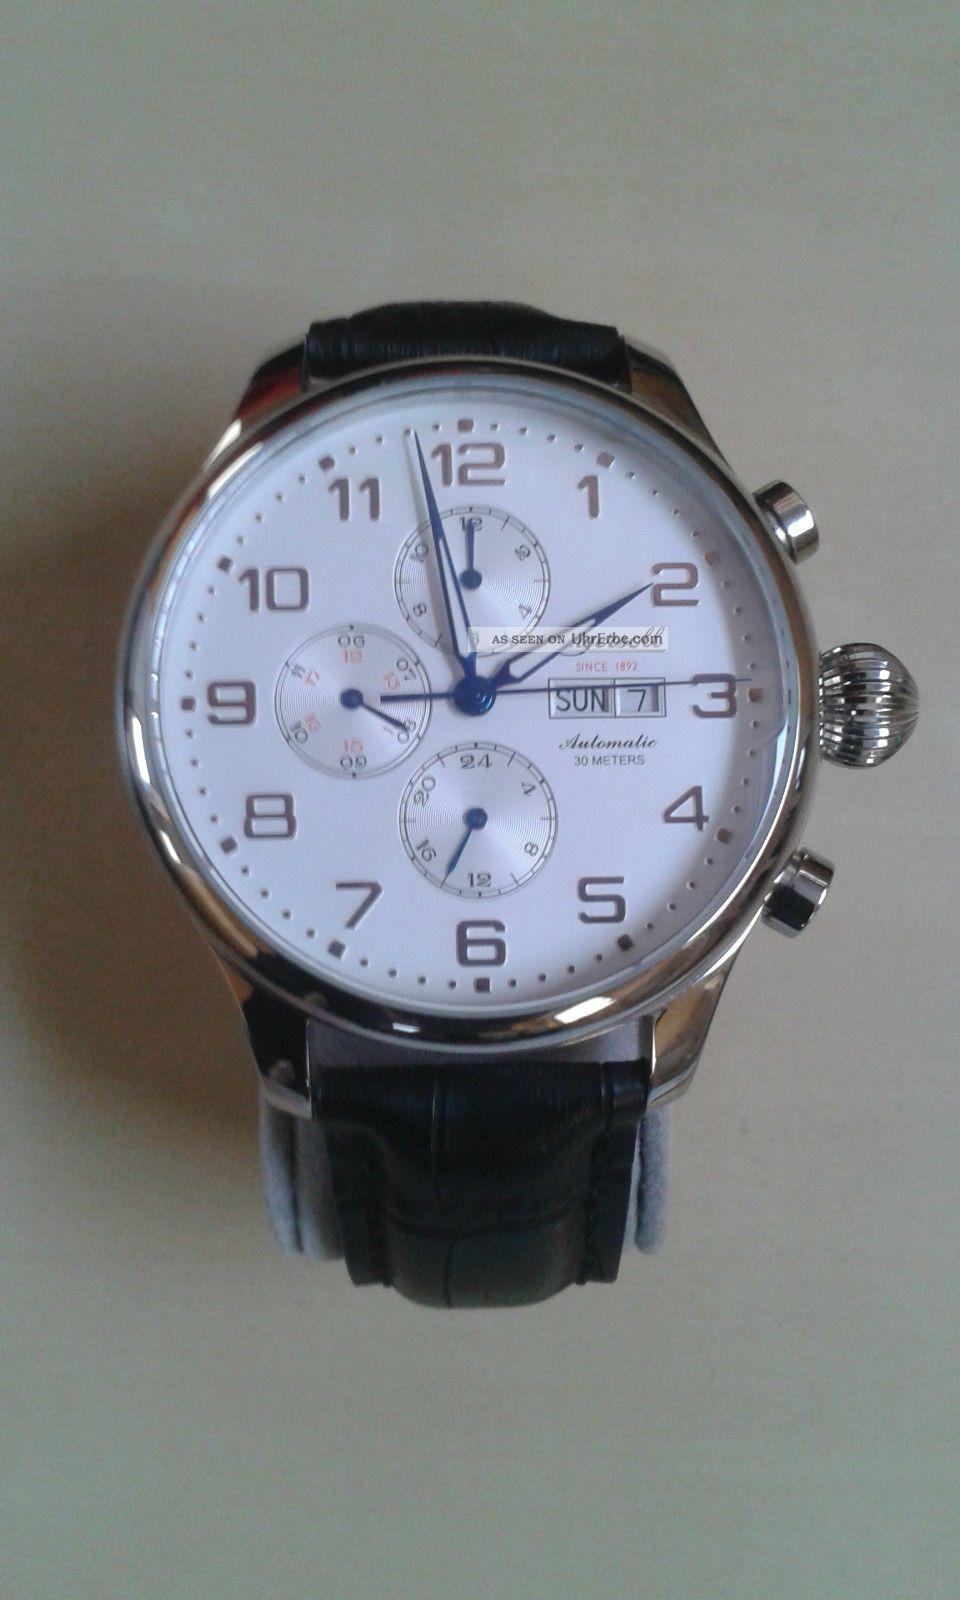 Ingersoll In3900sl Automatic Uhr,  Top Armbanduhren Bild